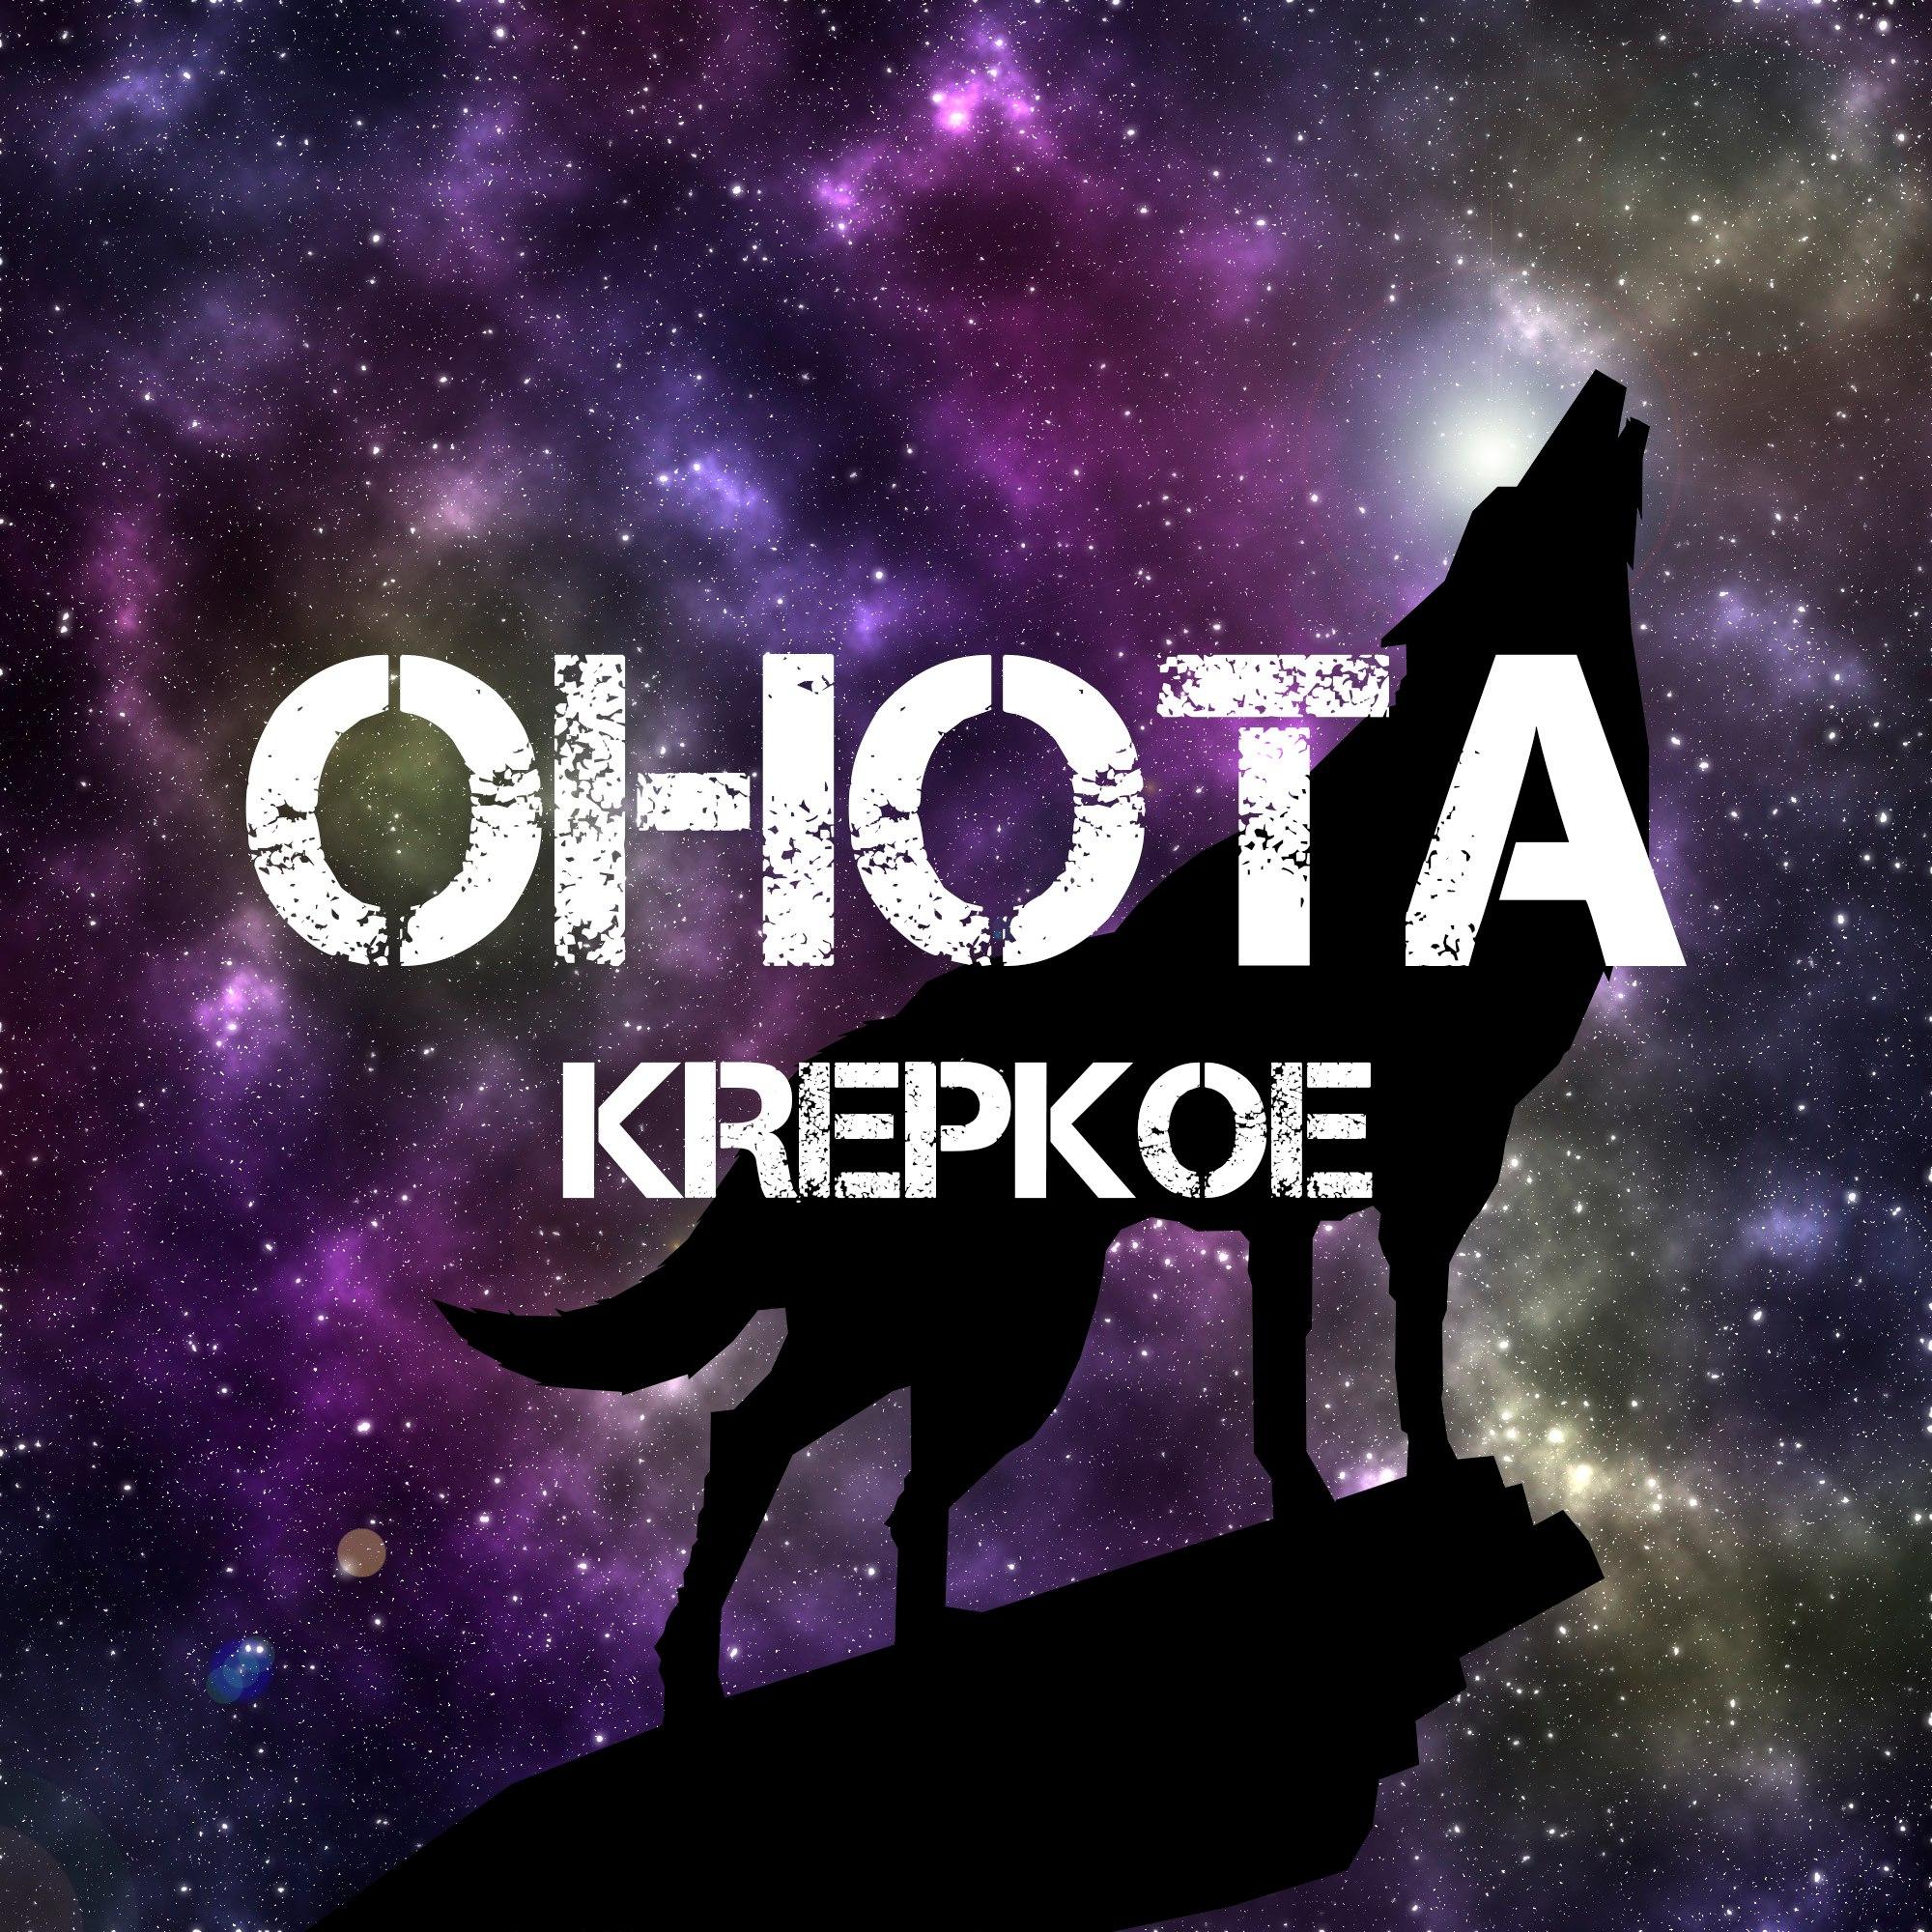 OHOTA KREPKOE - Soundtrack screenshot